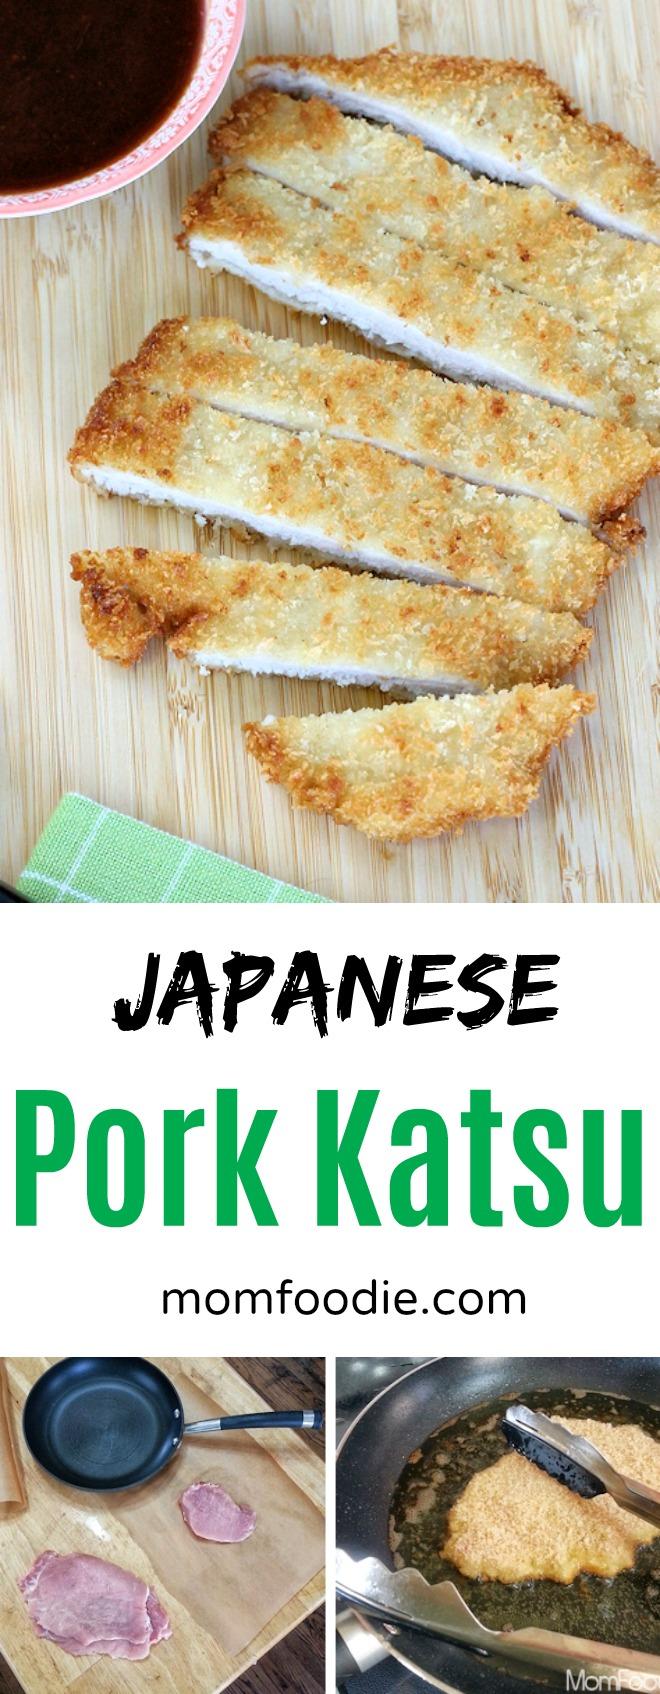 Pork Katsu Recipe : Easy Japanese Pork Tonkatsu Breaded Cutlets with Katsu sauce, kids will love. #japanesefood #porkrecipes